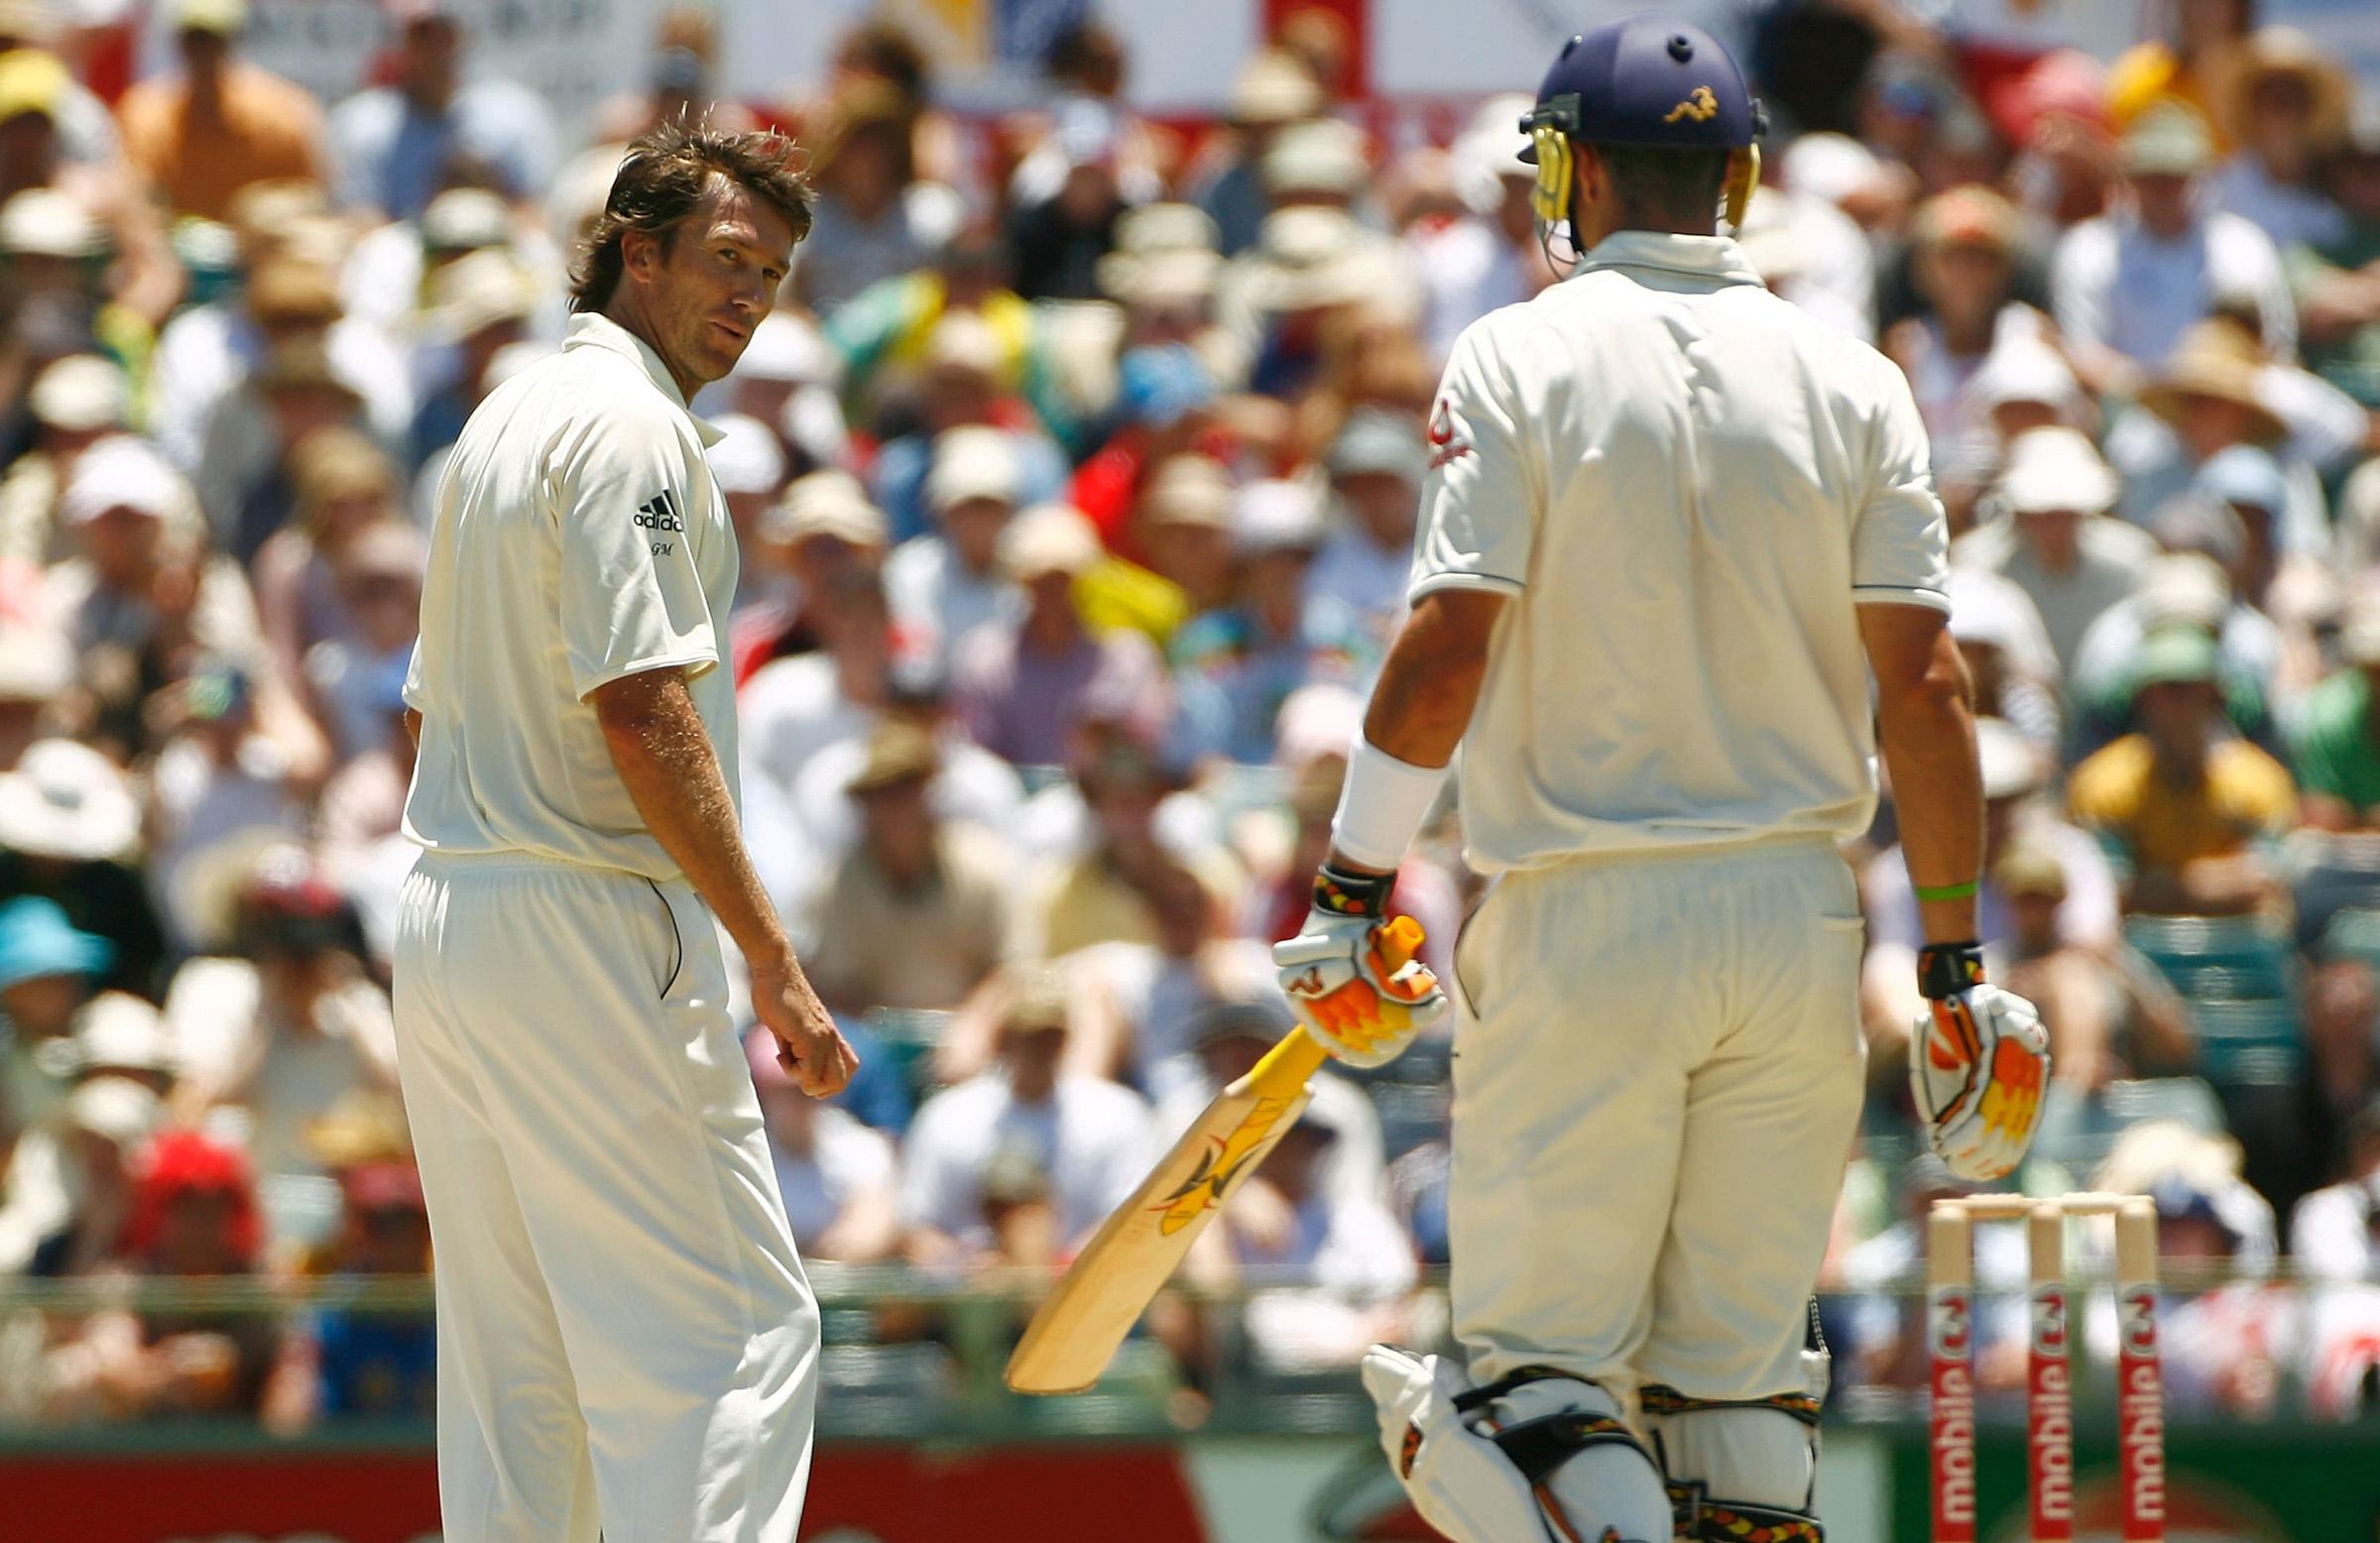 McGrath and Pietersen had a running battle during the 2006-07 series // Getty